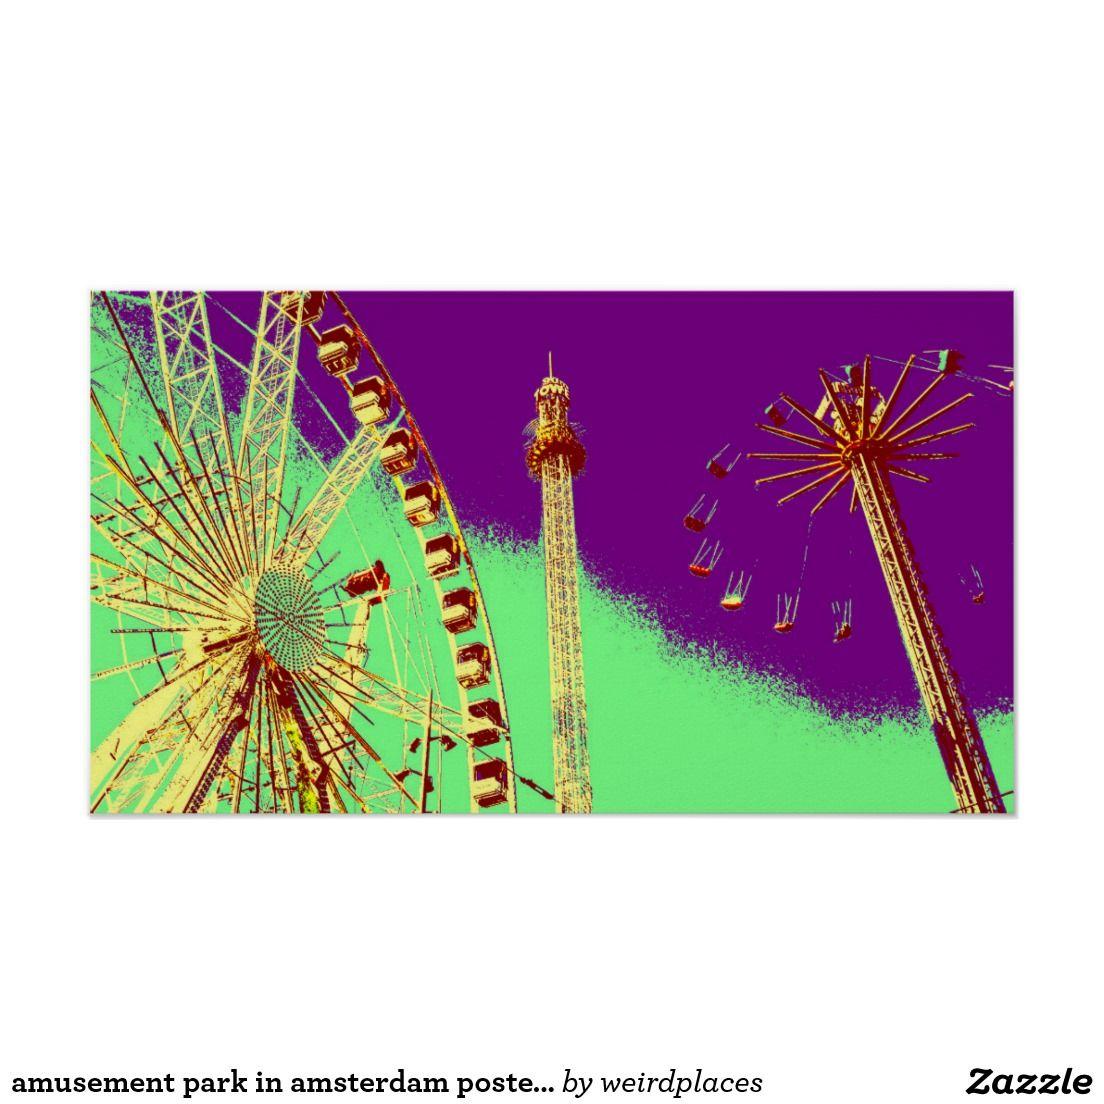 amusement park in amsterdam posterize effect photo